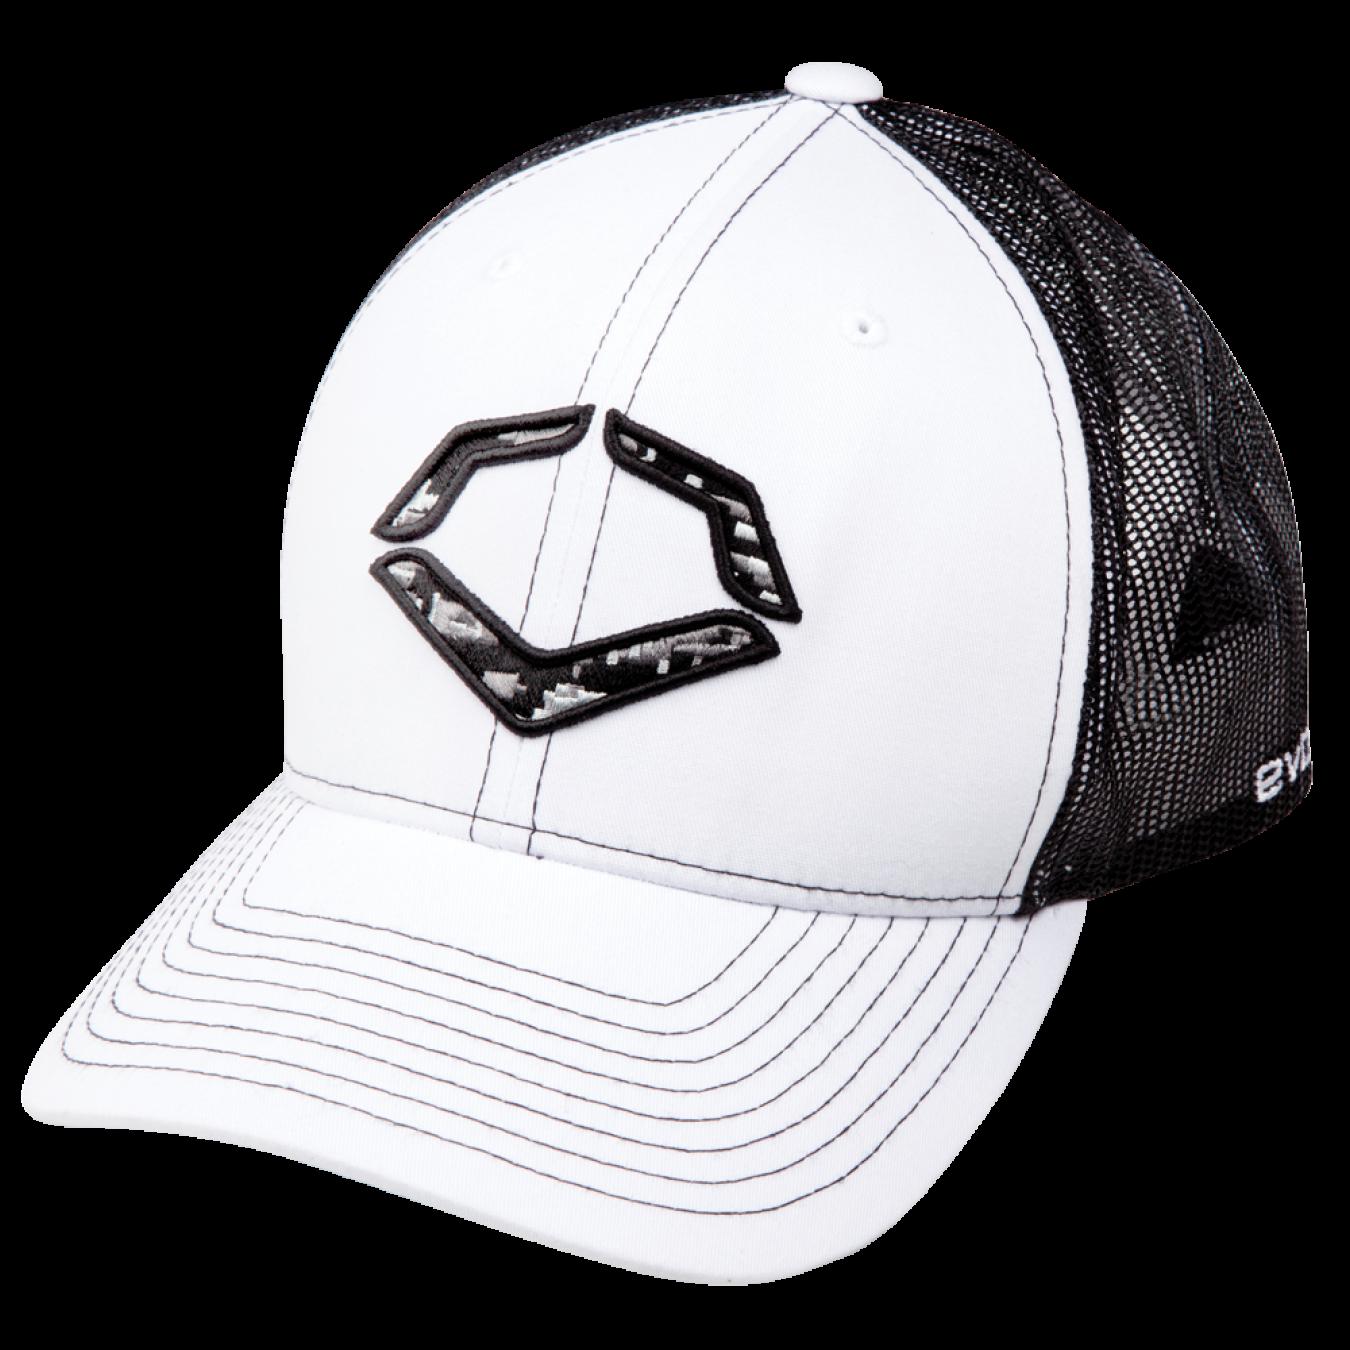 competitive price save off pre order EvoShield White Grey Black DigiCamo Logo Hat   The essentials ...